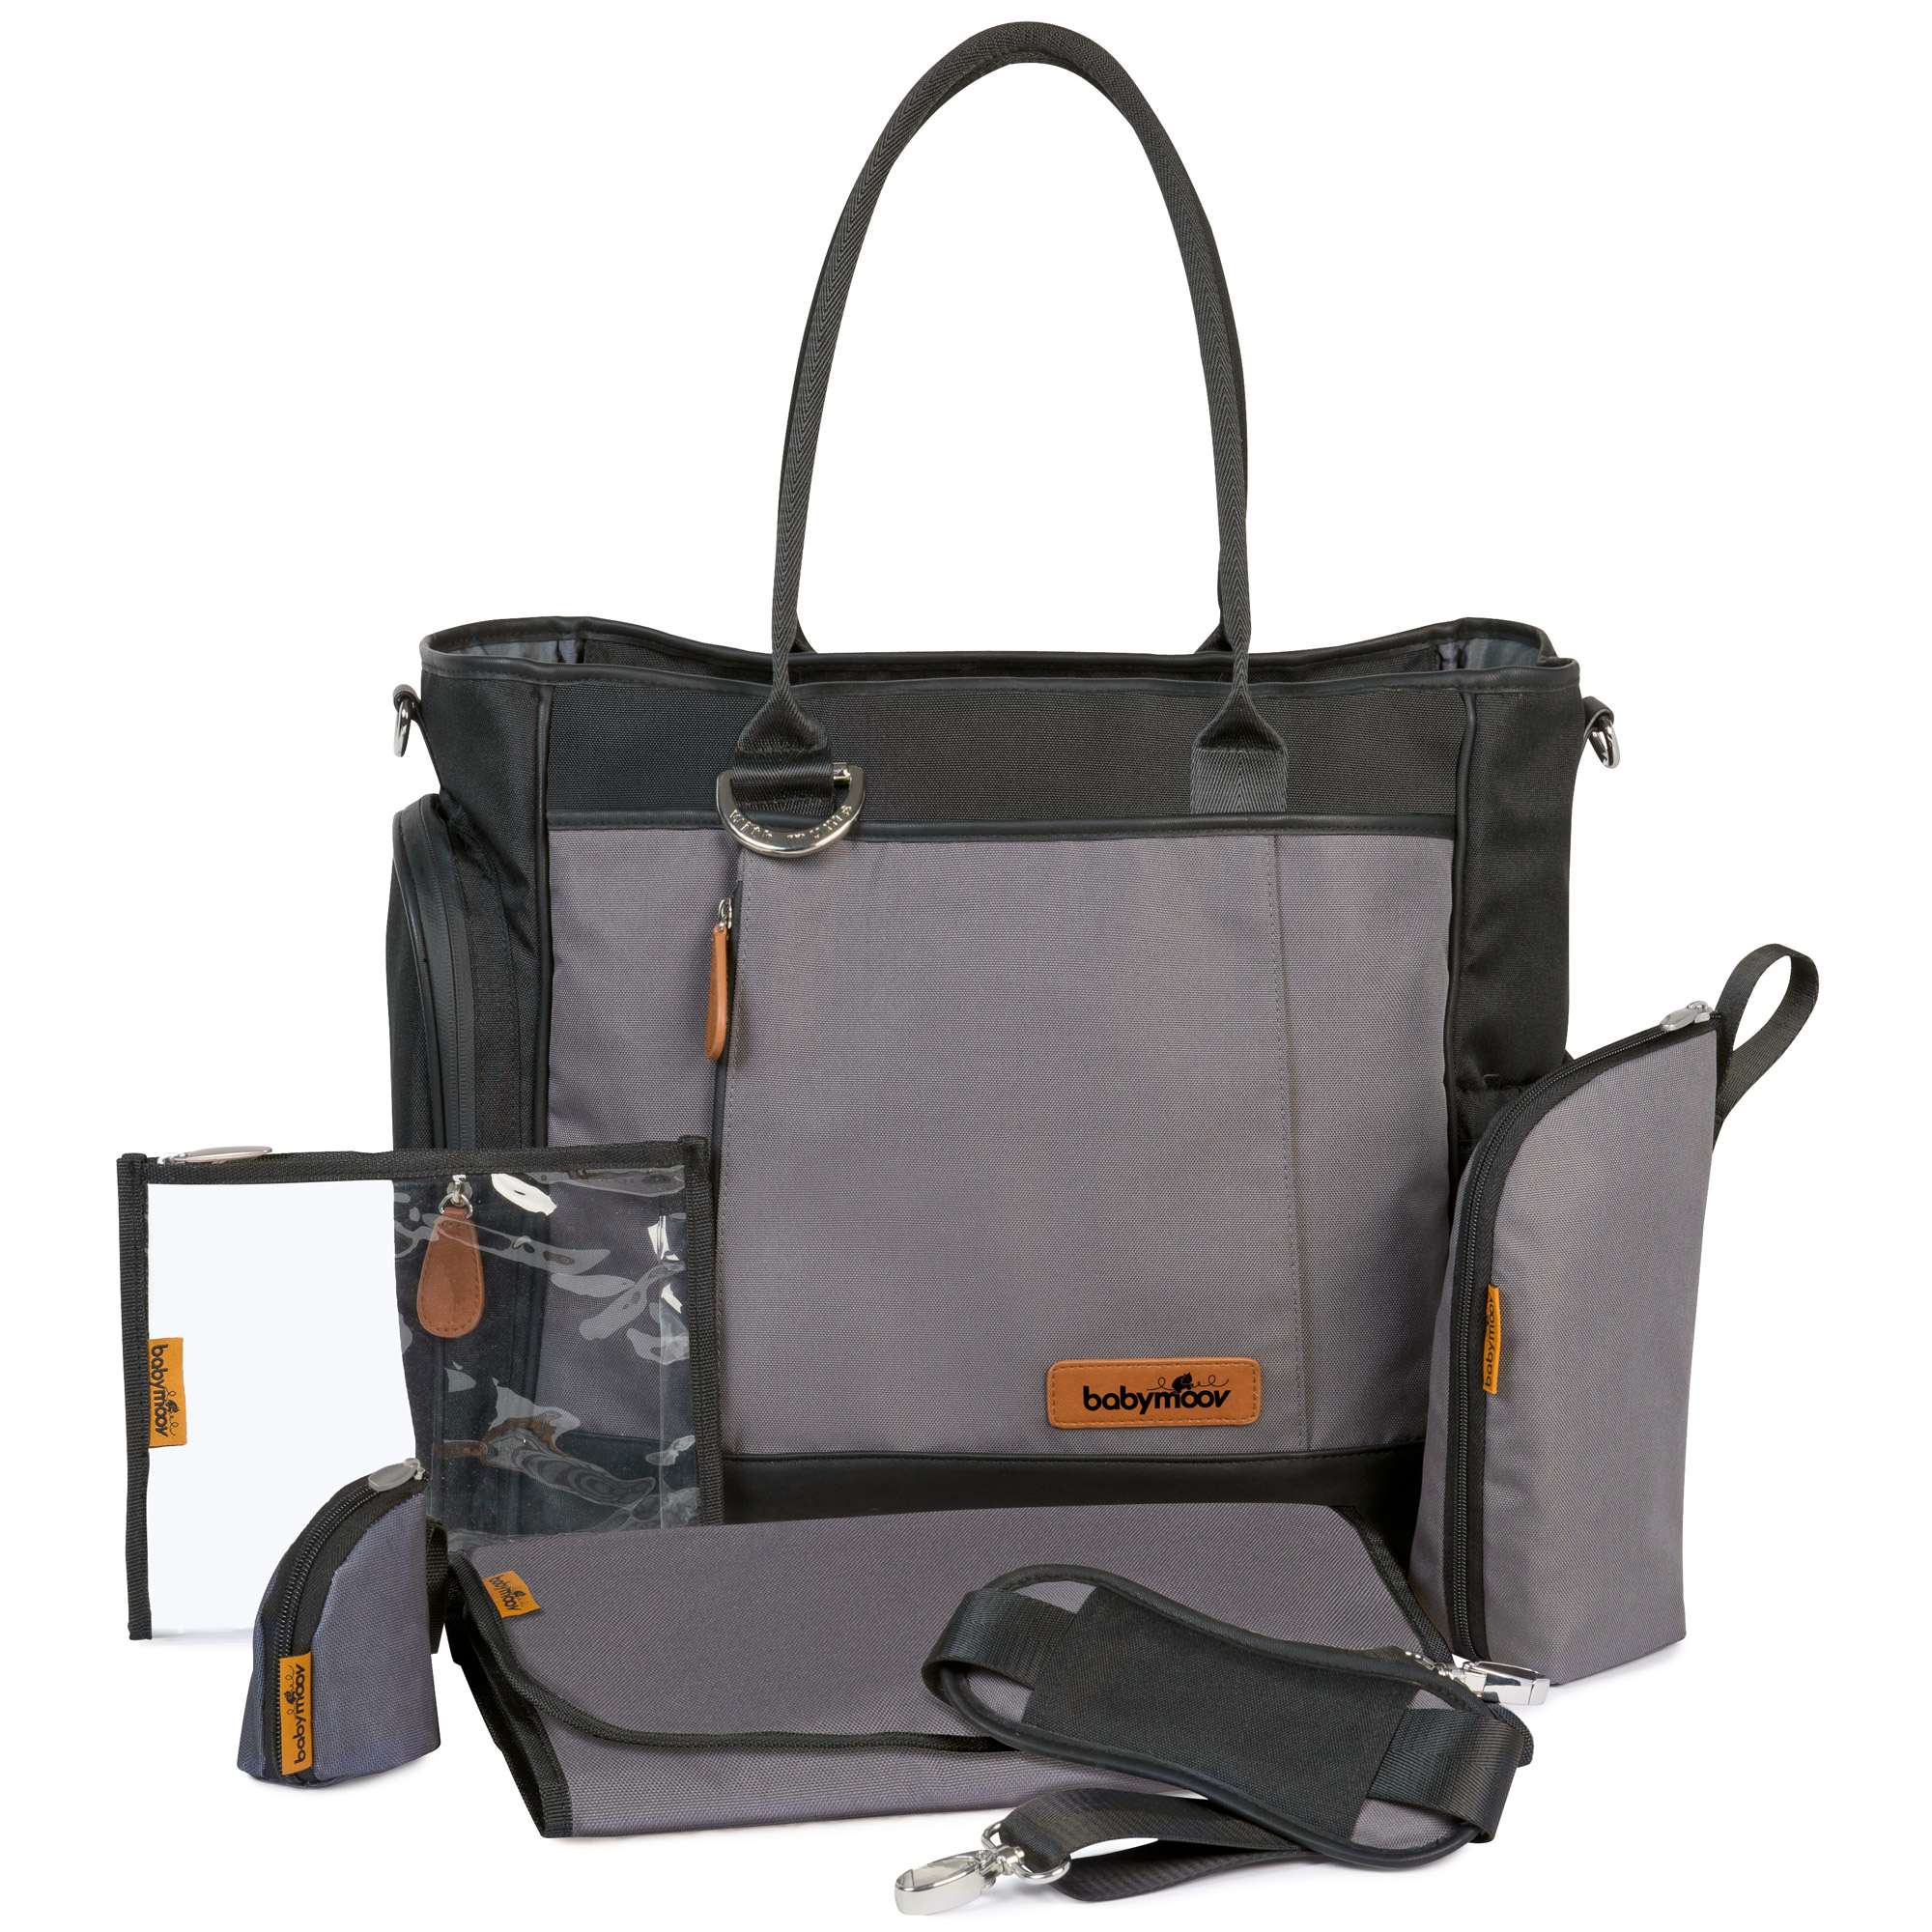 Sac essential bag Black de Babymoov, Sacs à langer   Aubert df57693f3e82